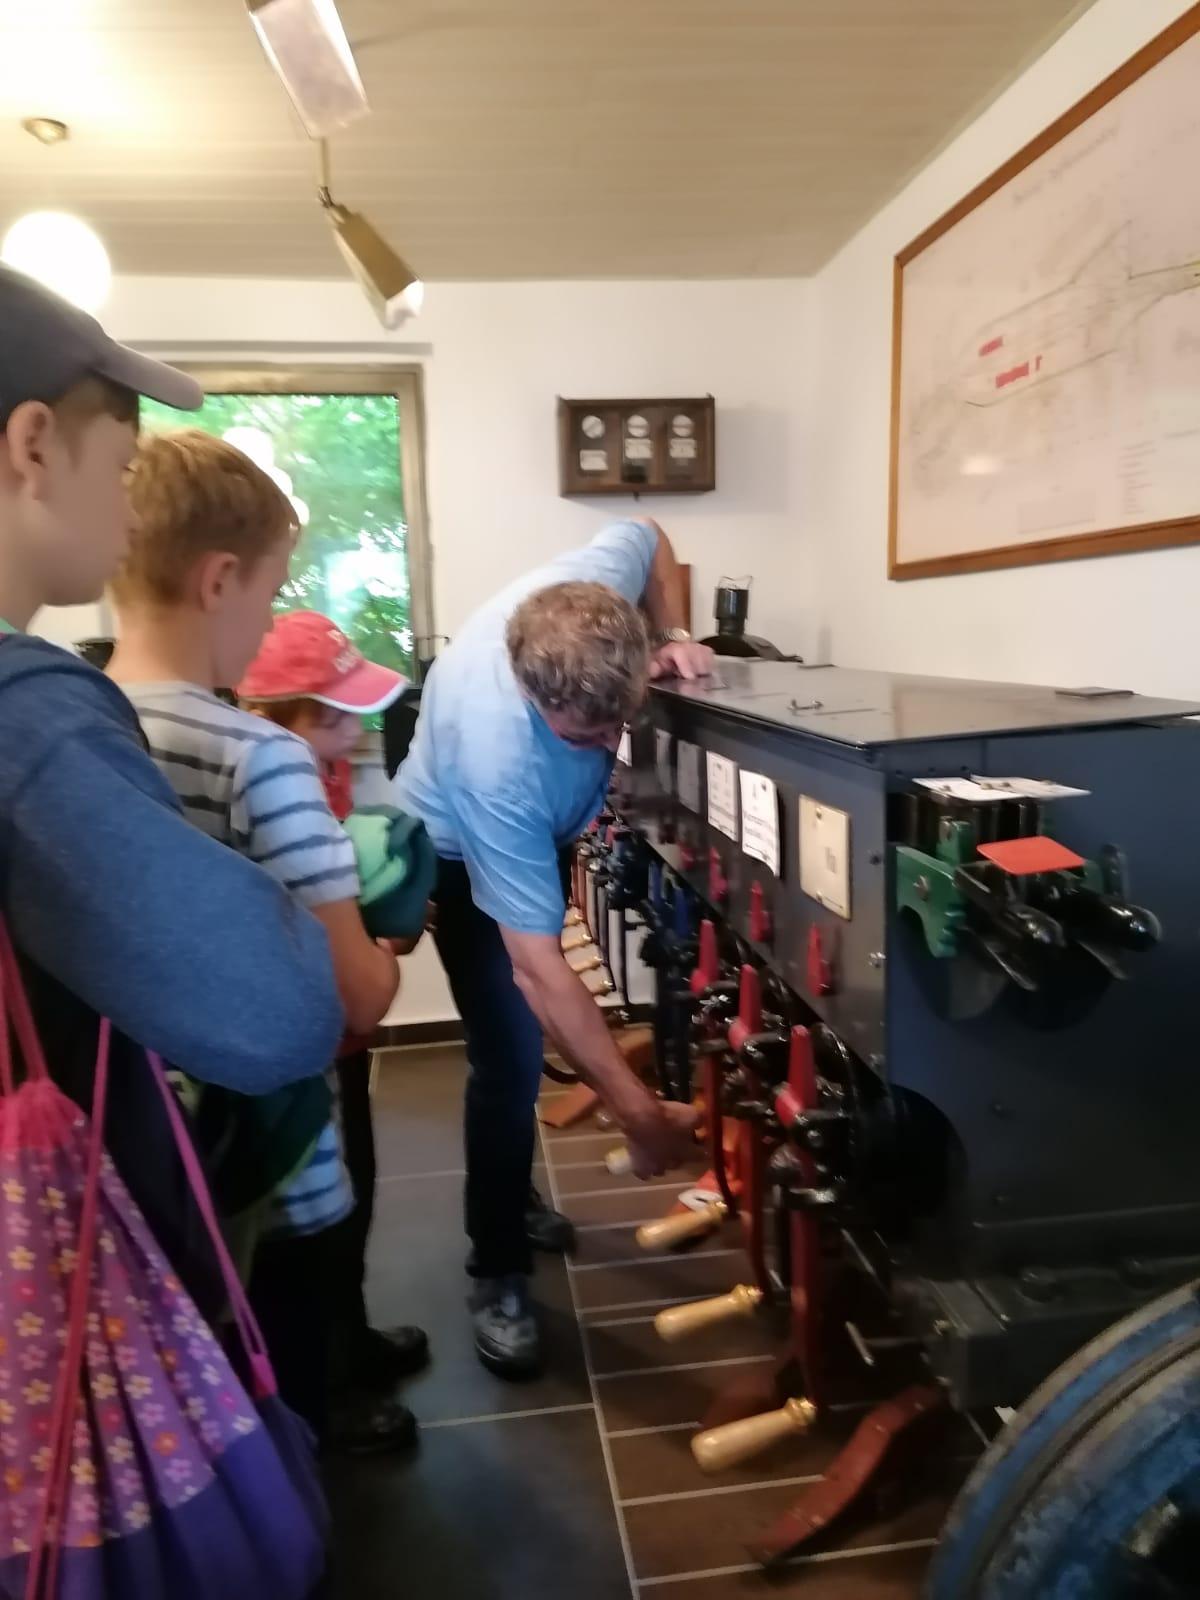 Ferientag 3: Eisenbahnmuseum Seifhennersdorf